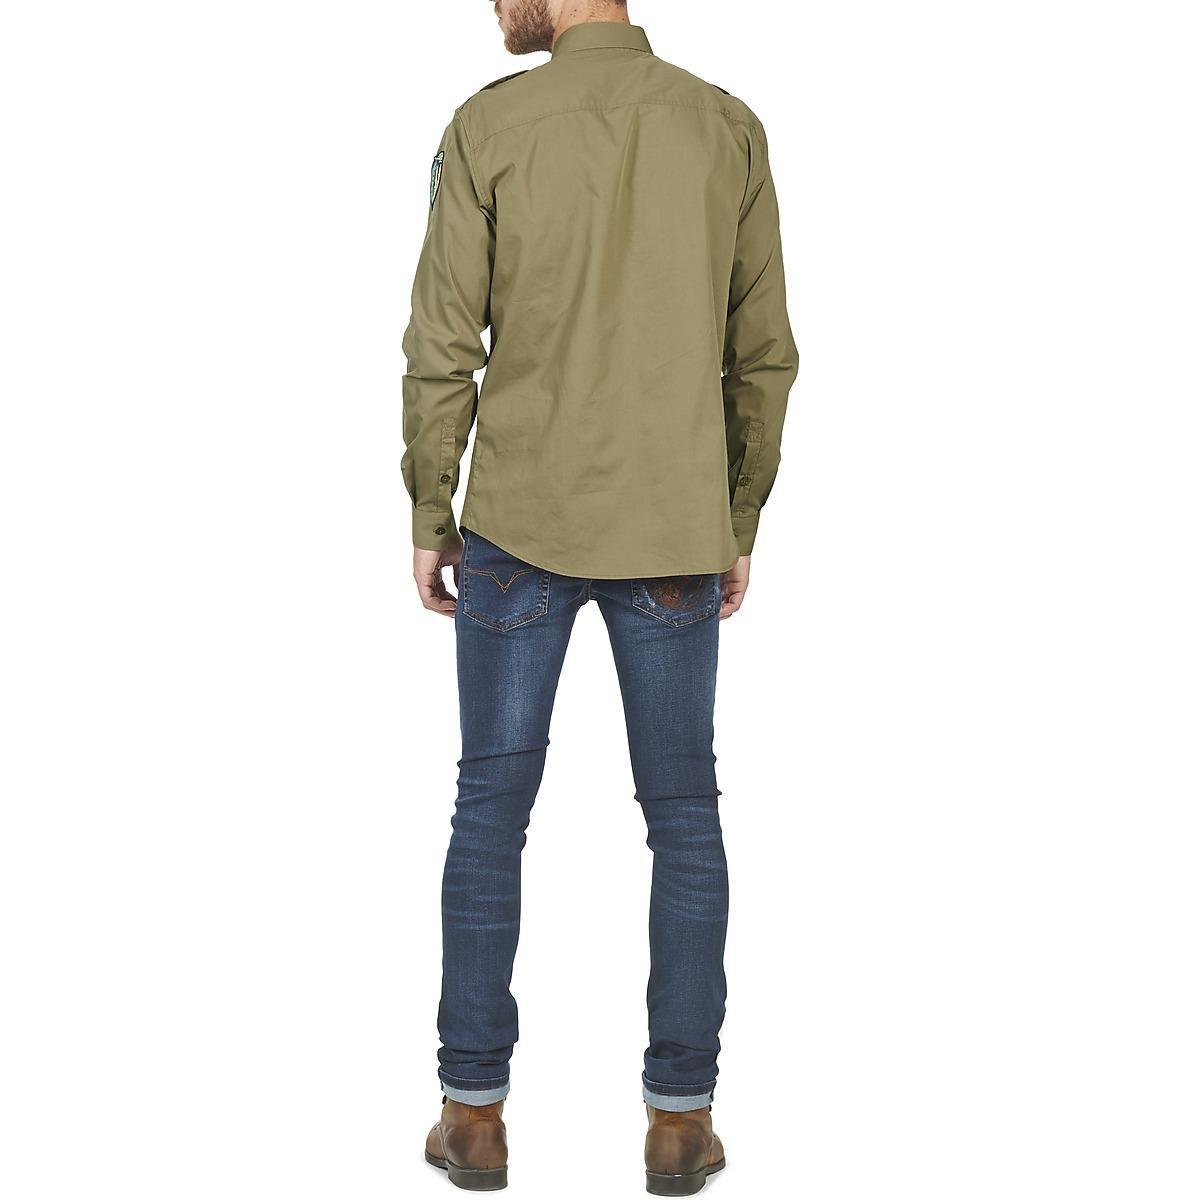 Versace Jeans Couture Denim Farseta Long Sleeved Shirt in Green for Men